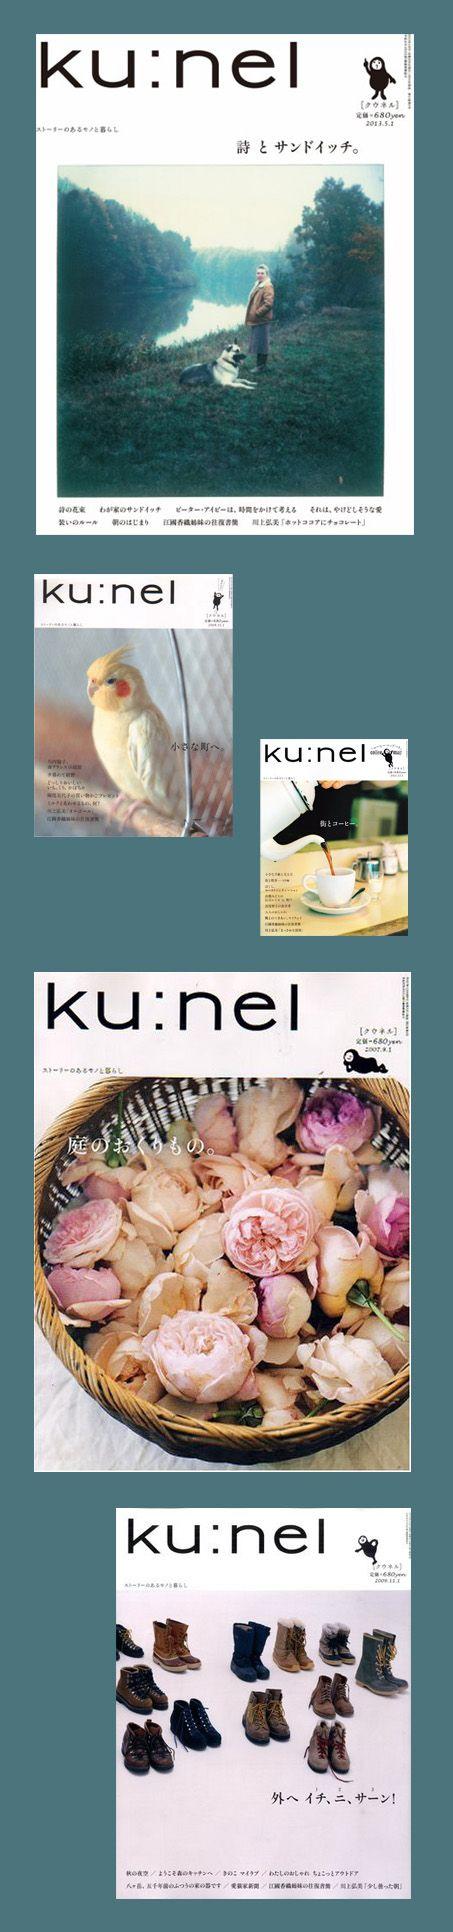 Kunel